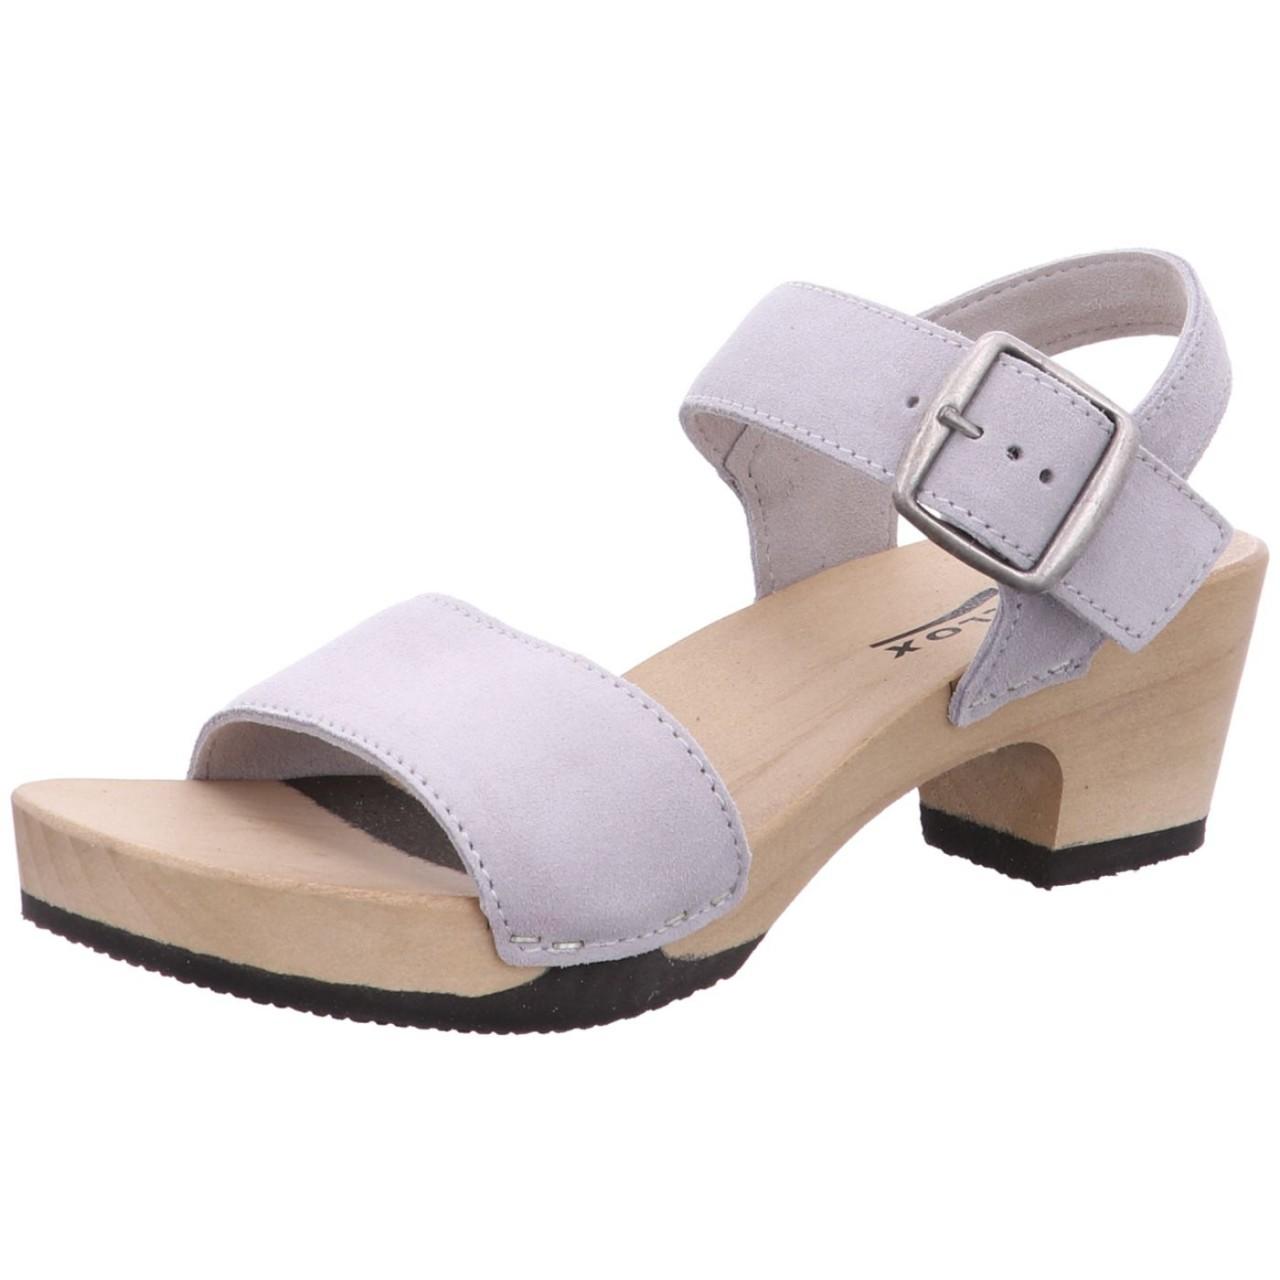 Softclox Sandale Kea Grau 3380 grau